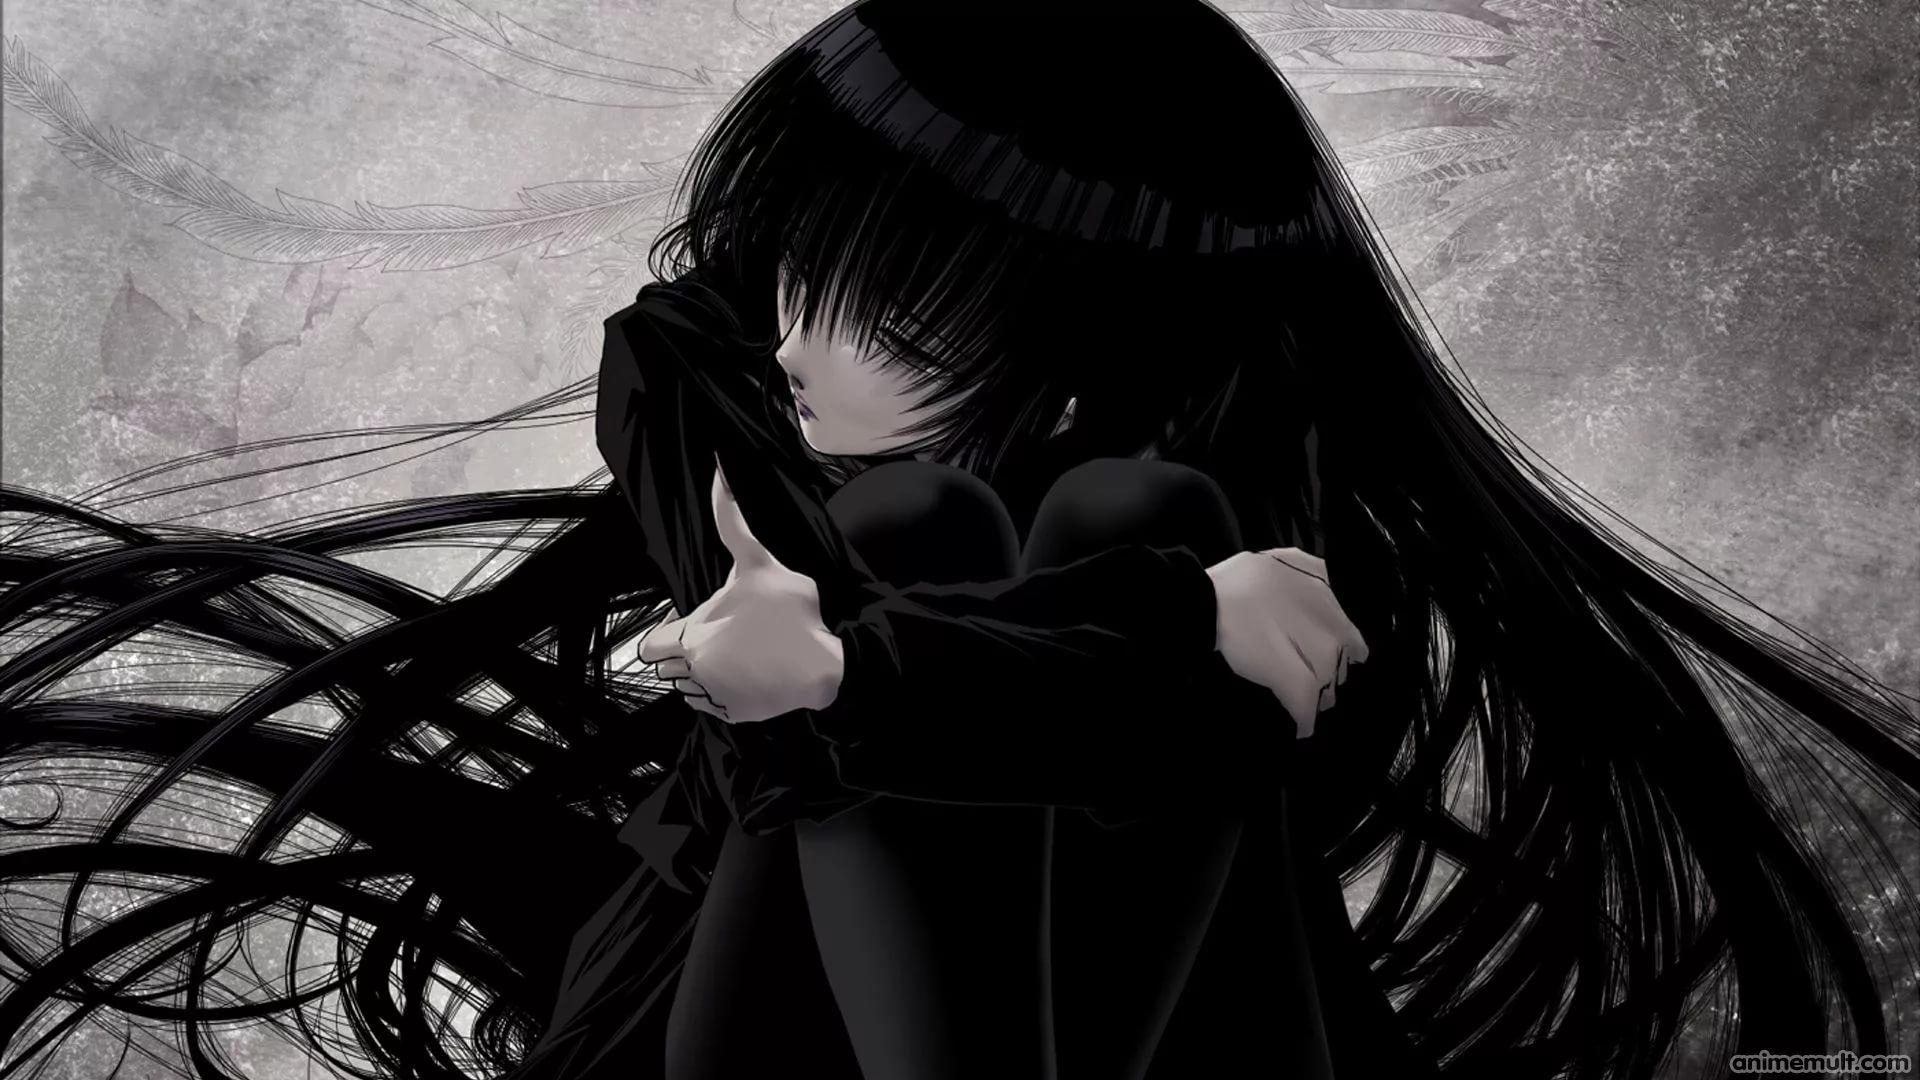 Dark Anime wallpaper photo